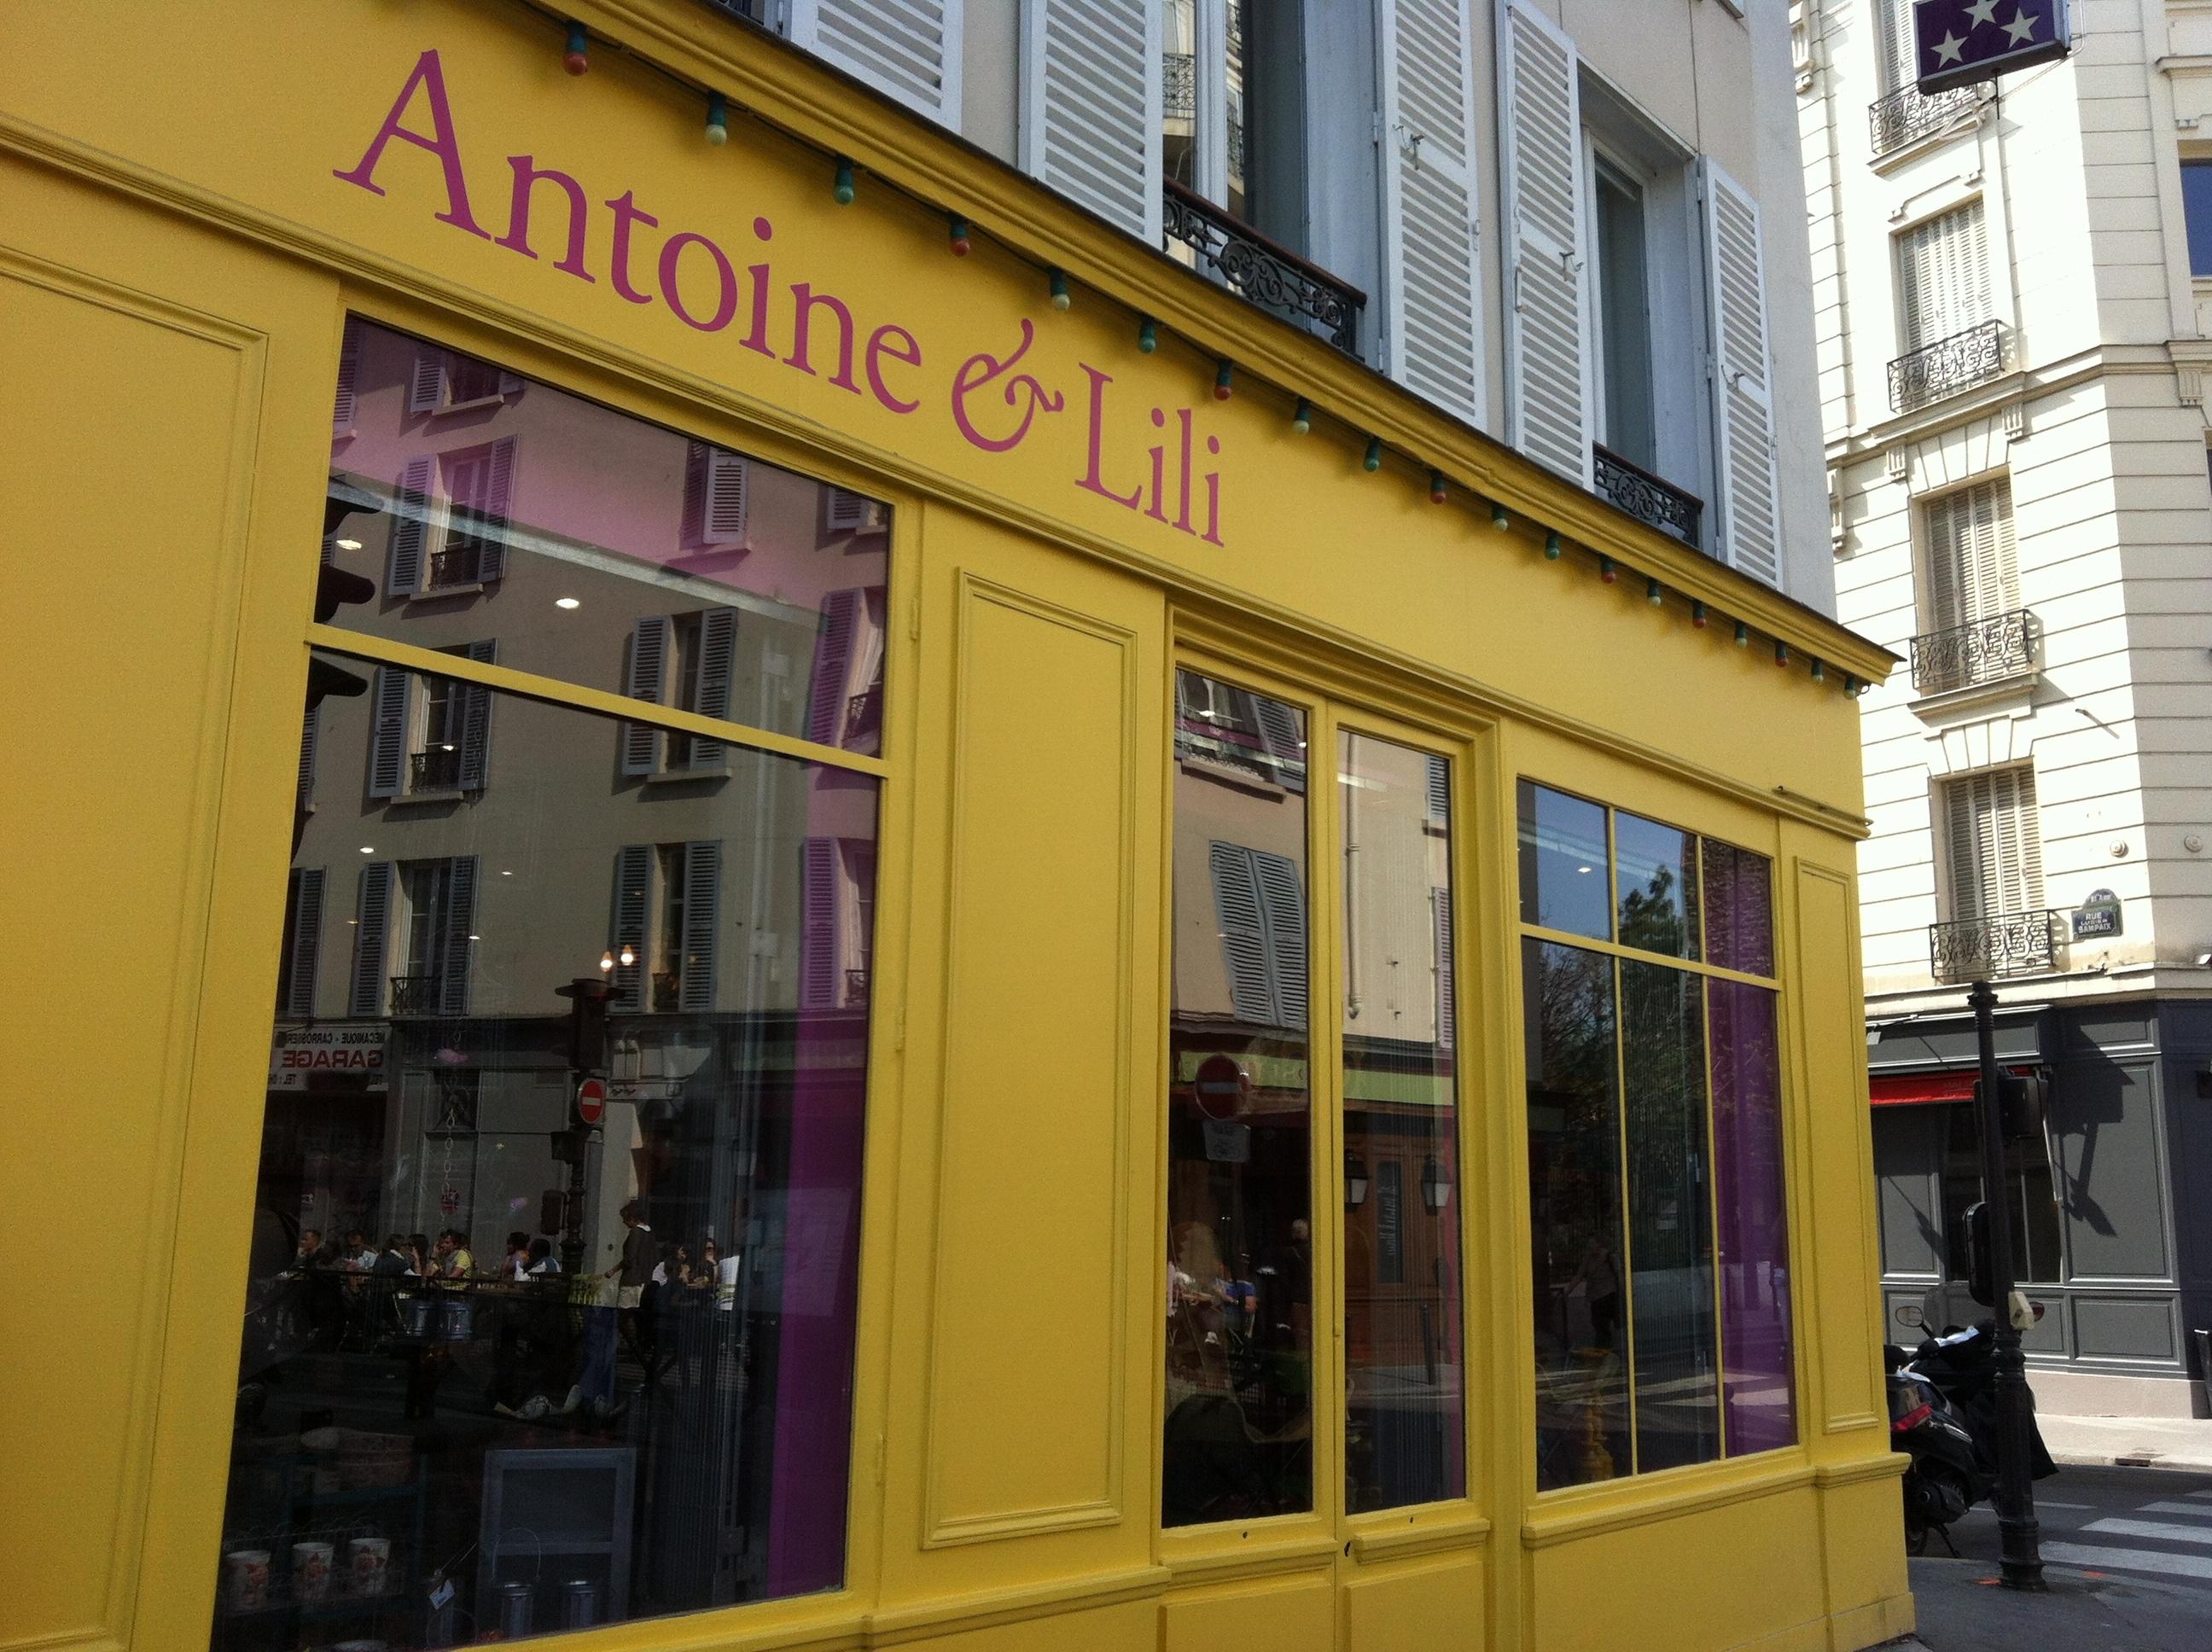 De la sape • Antoine et Lili